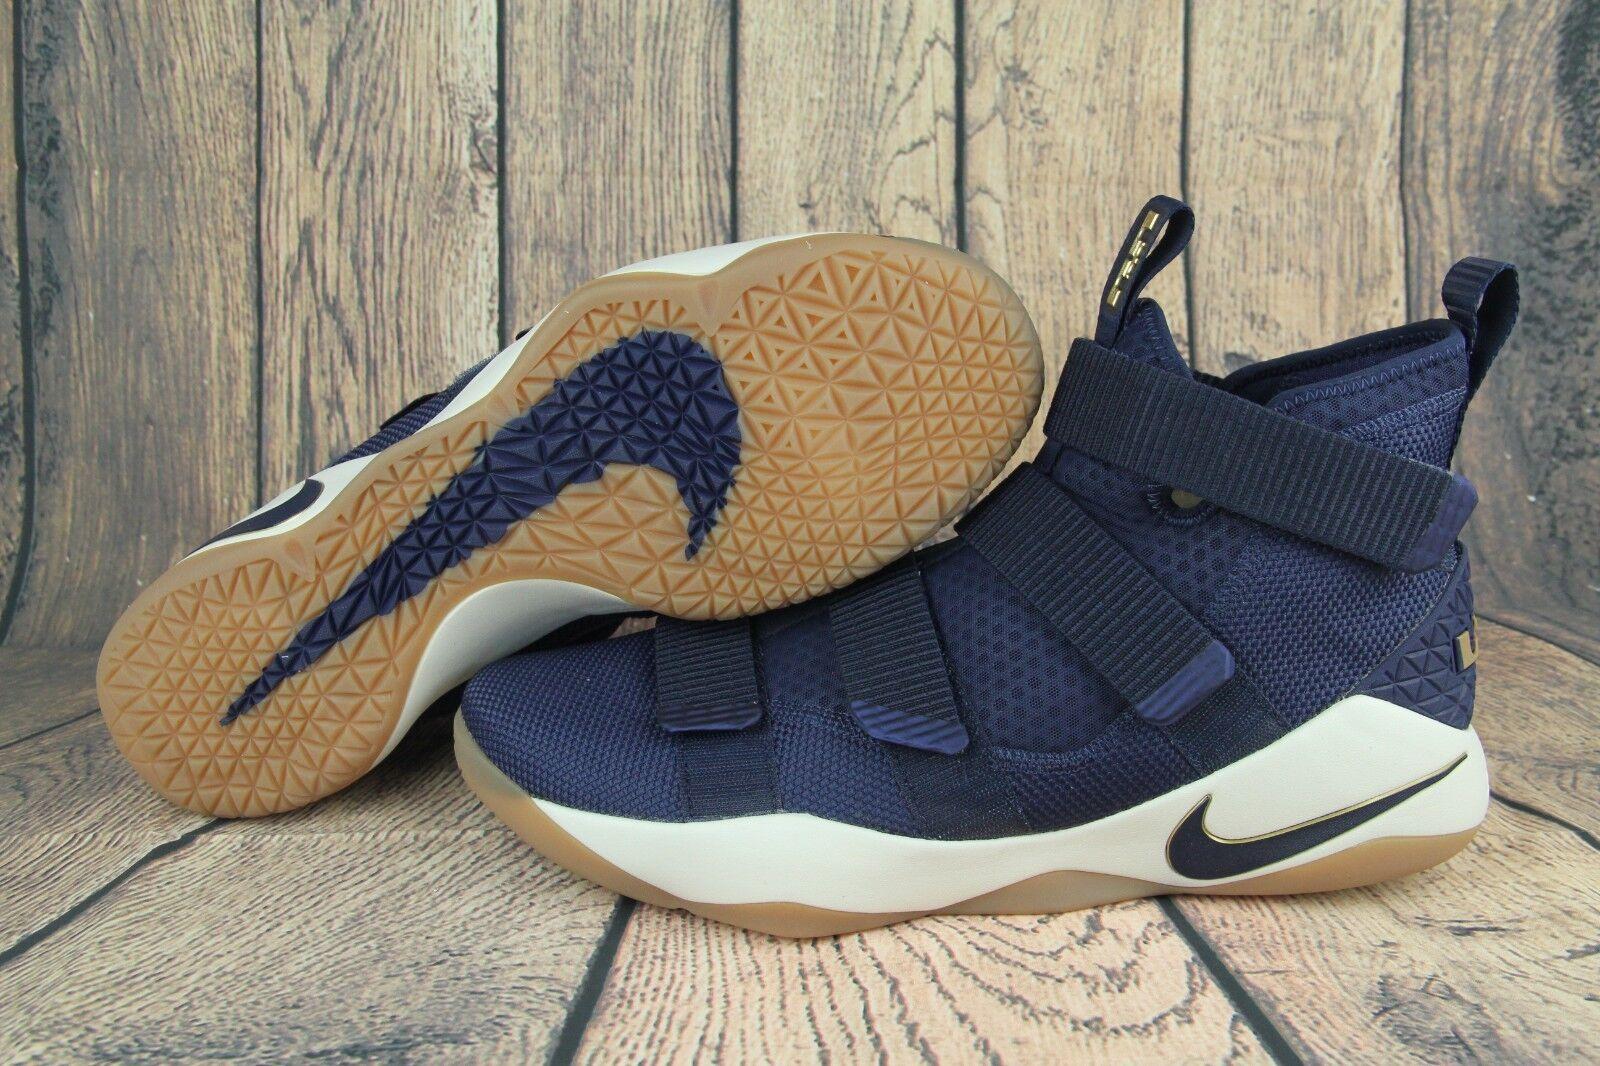 buy online 41f56 1016b ... Nike LeBron LBJ Soldier XI XI XI Midnight Navy Metallic Gold 897644-402  SZ ...